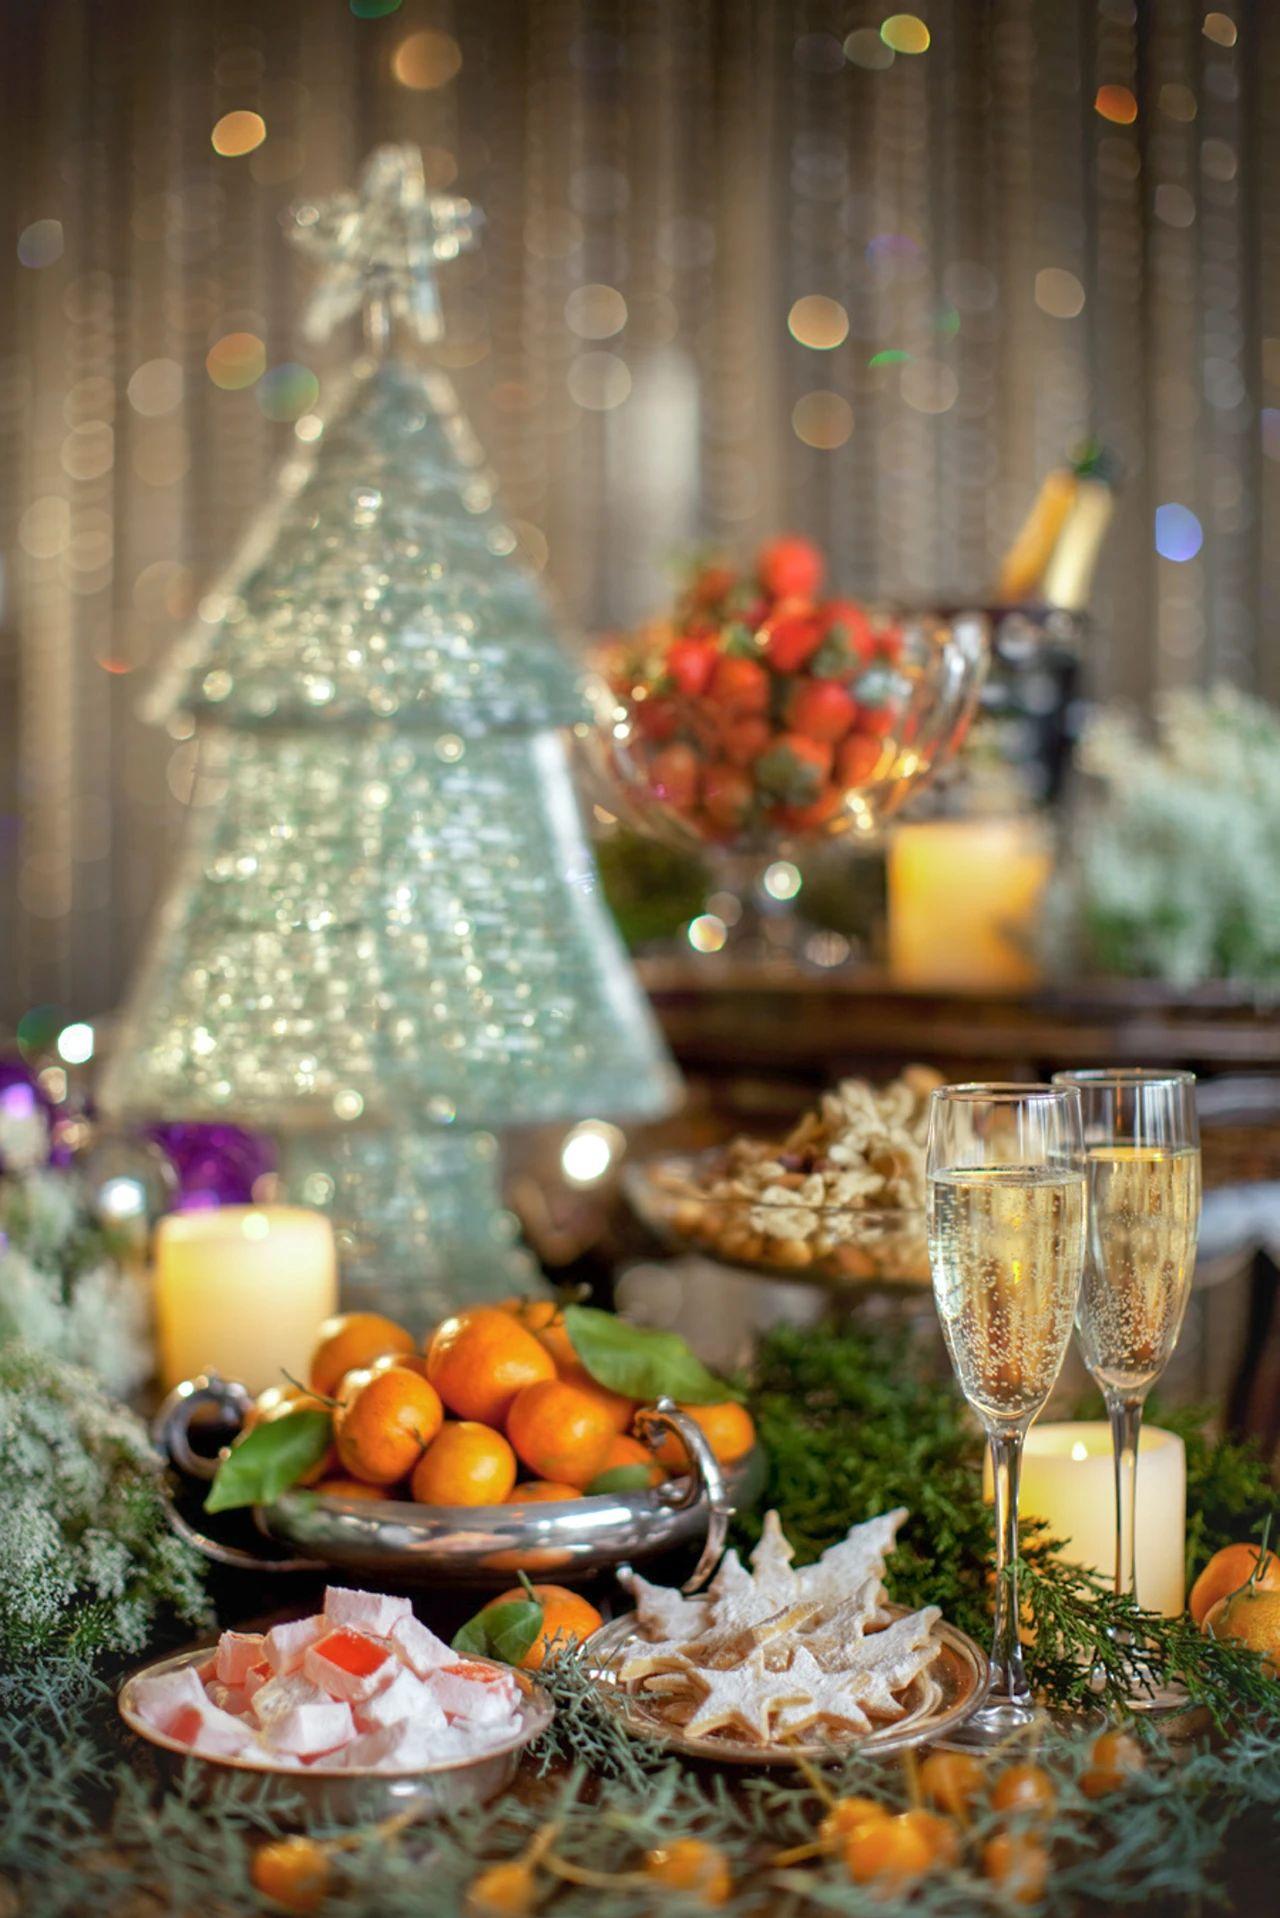 圣诞新年早计划 PLANNING AHEAD